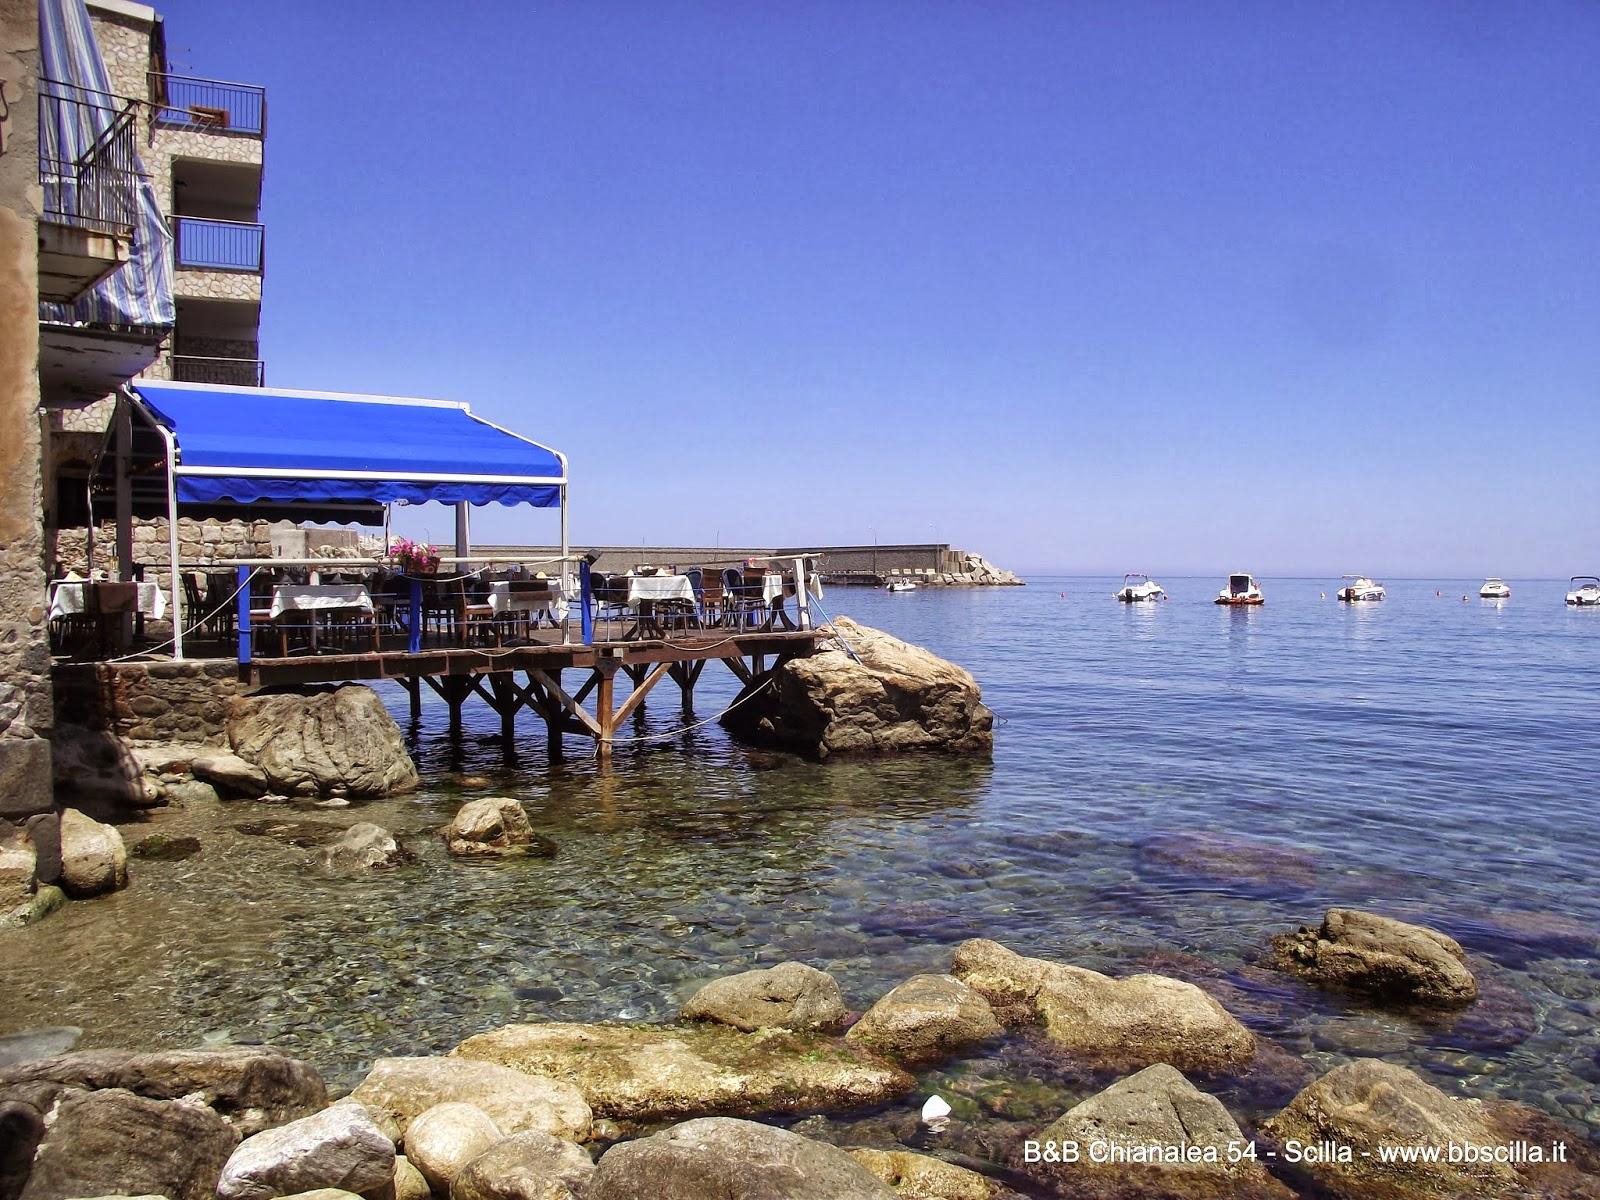 Restaurants Chianalea sea